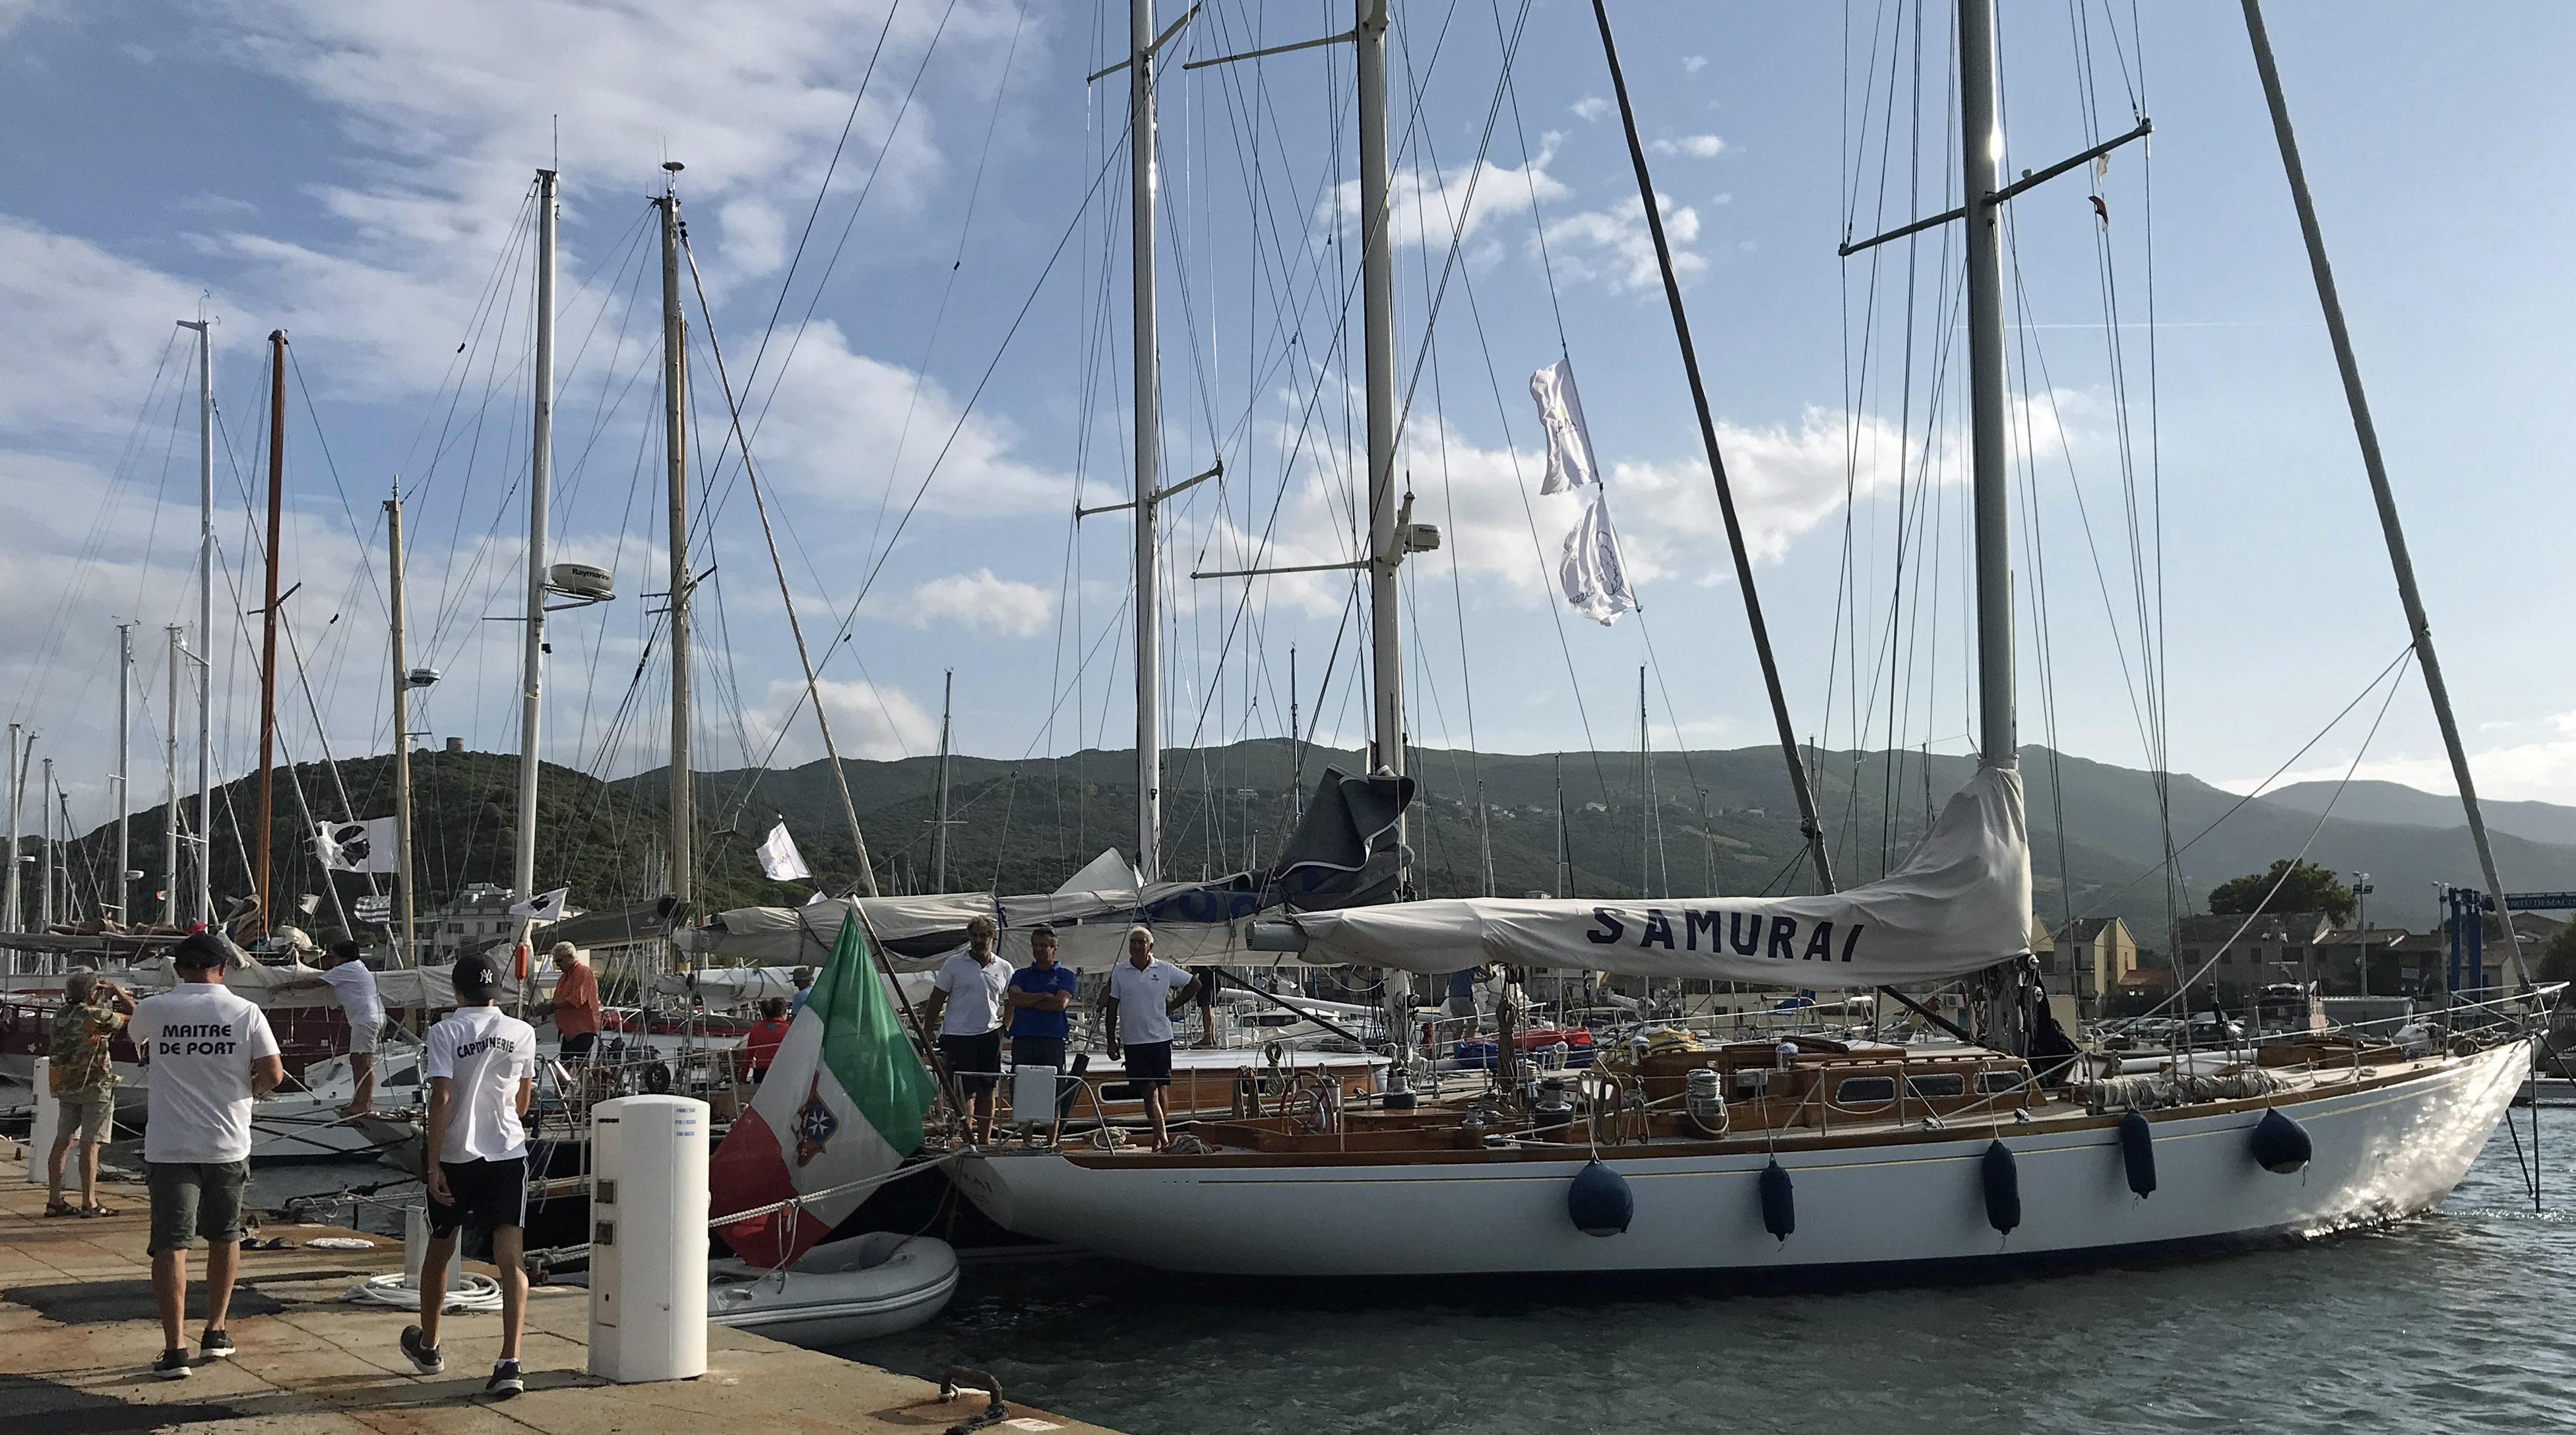 CC 2018 Bastia - Macinaggio la flotte au port de Macinaggio photo Thibaud Assante DR